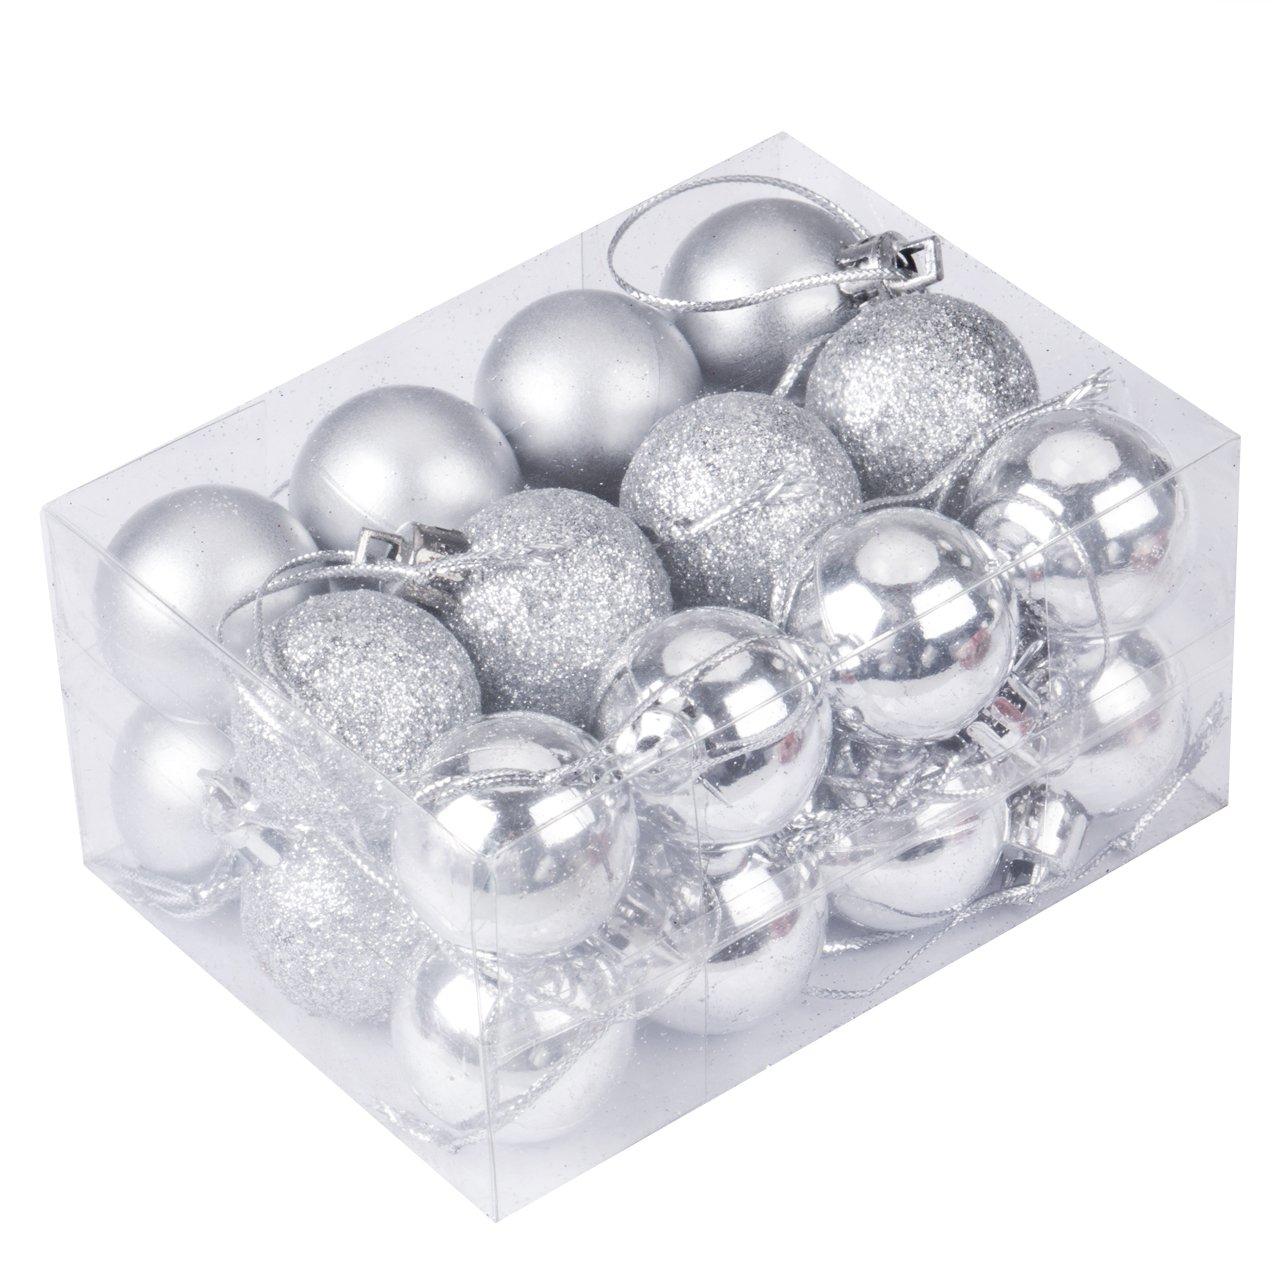 Amazon.com: 24pcs Christmas Balls Ornament Shatterproof Pendants For  Holiday Xmas Garden Decorations (White): Home U0026 Kitchen